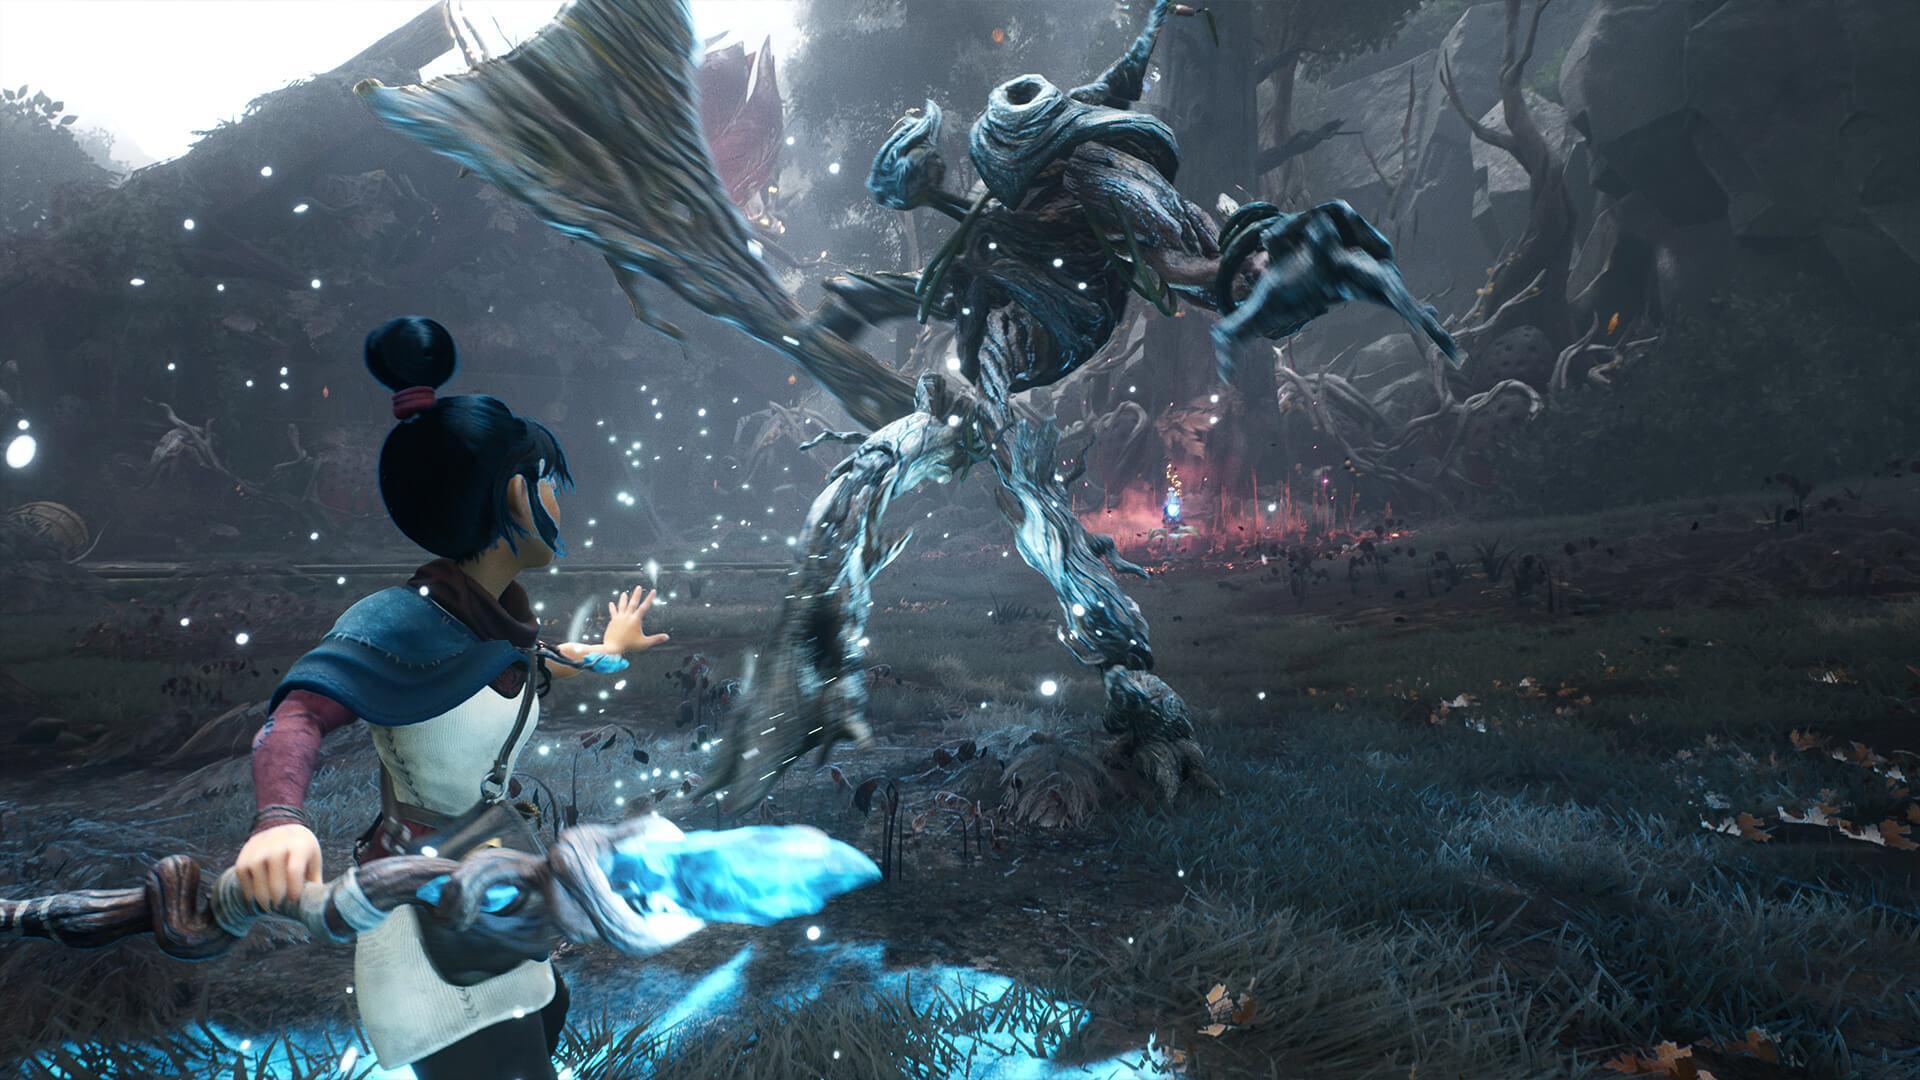 Kena Bridge of Spirits, Release Date, Trailer, Gameplay